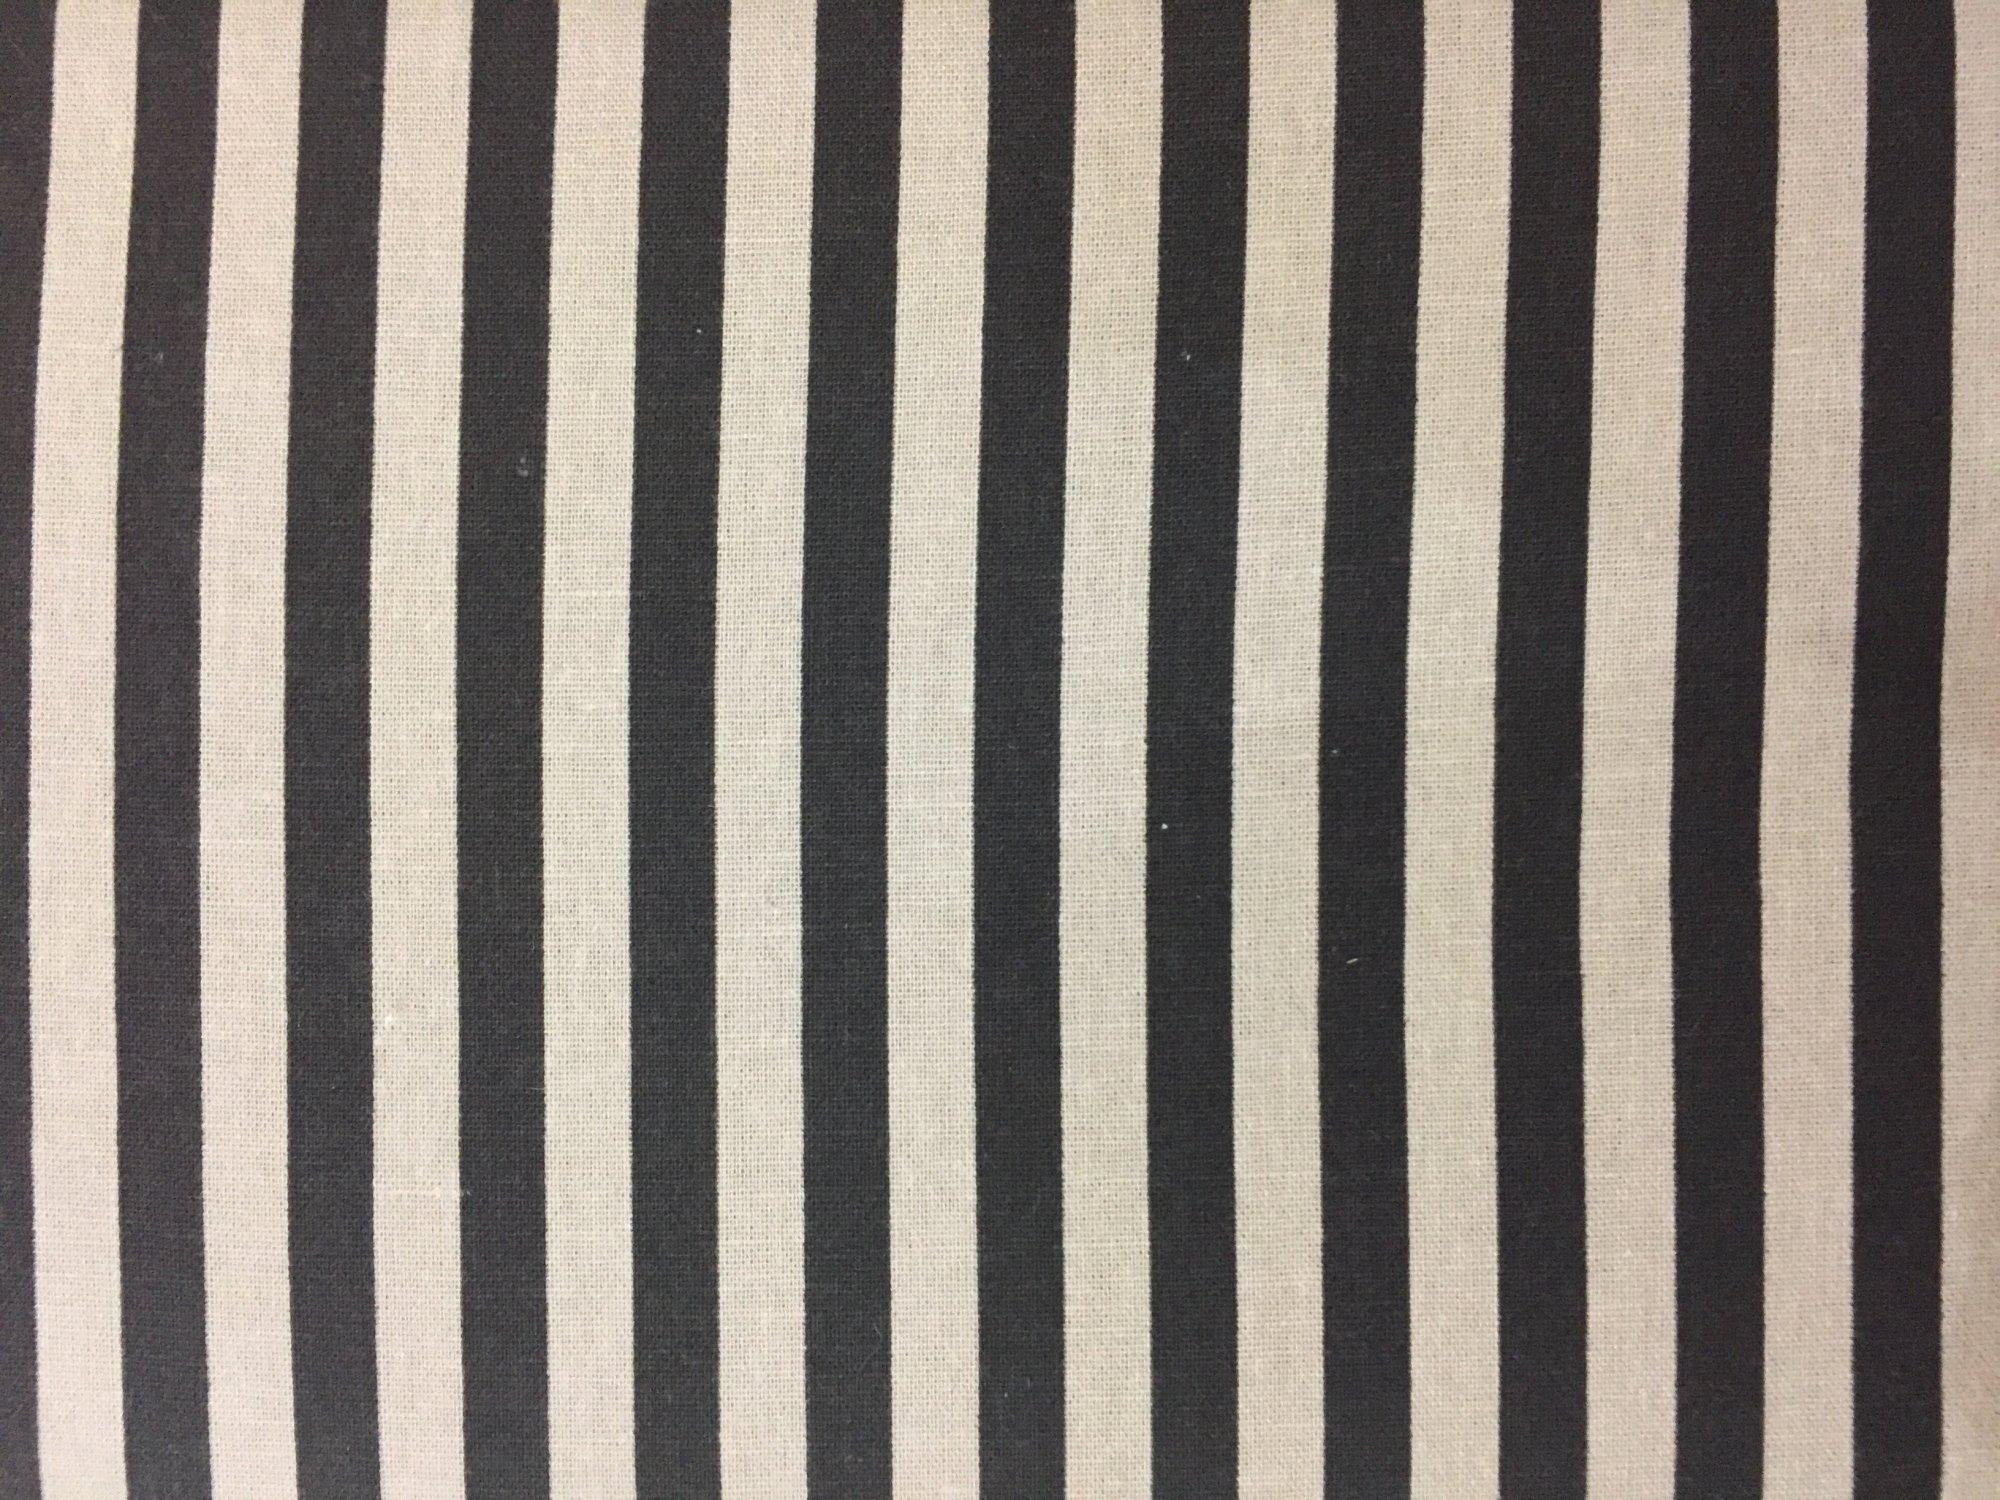 Yuwa - Thick Stripes - Brown